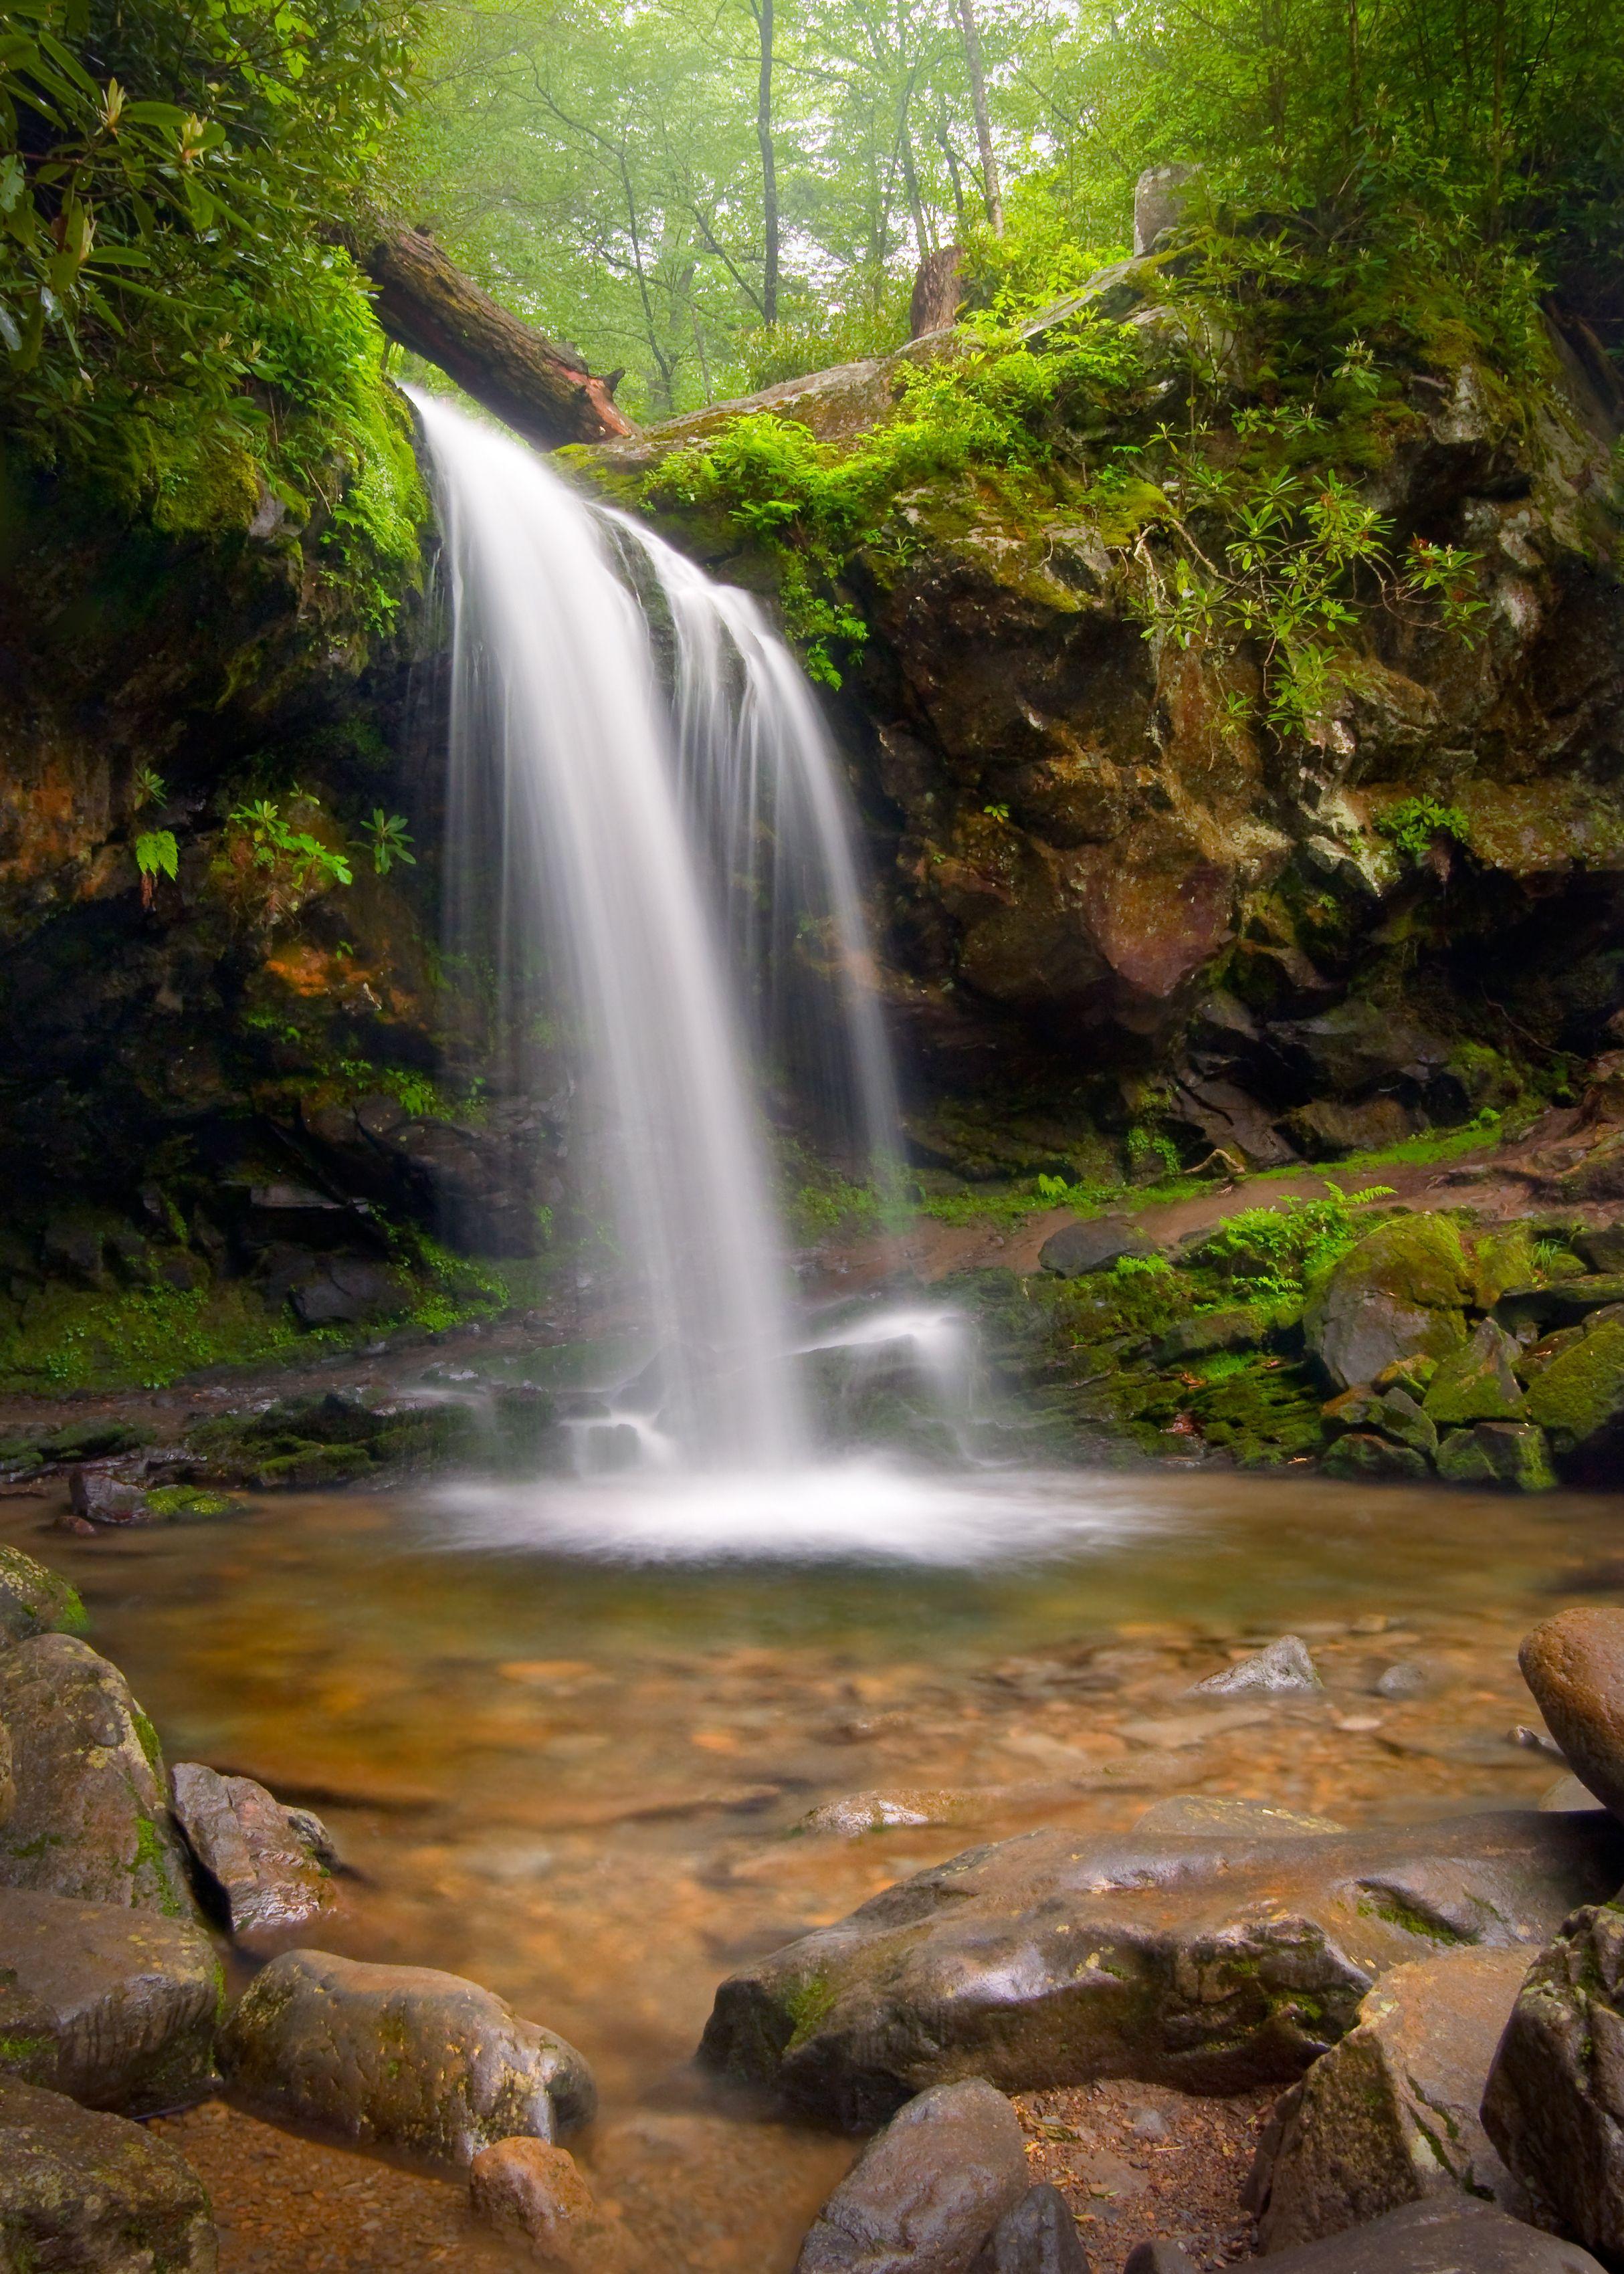 Foster Falls Hike To An Outstandingly Beautiful Waterfall Near